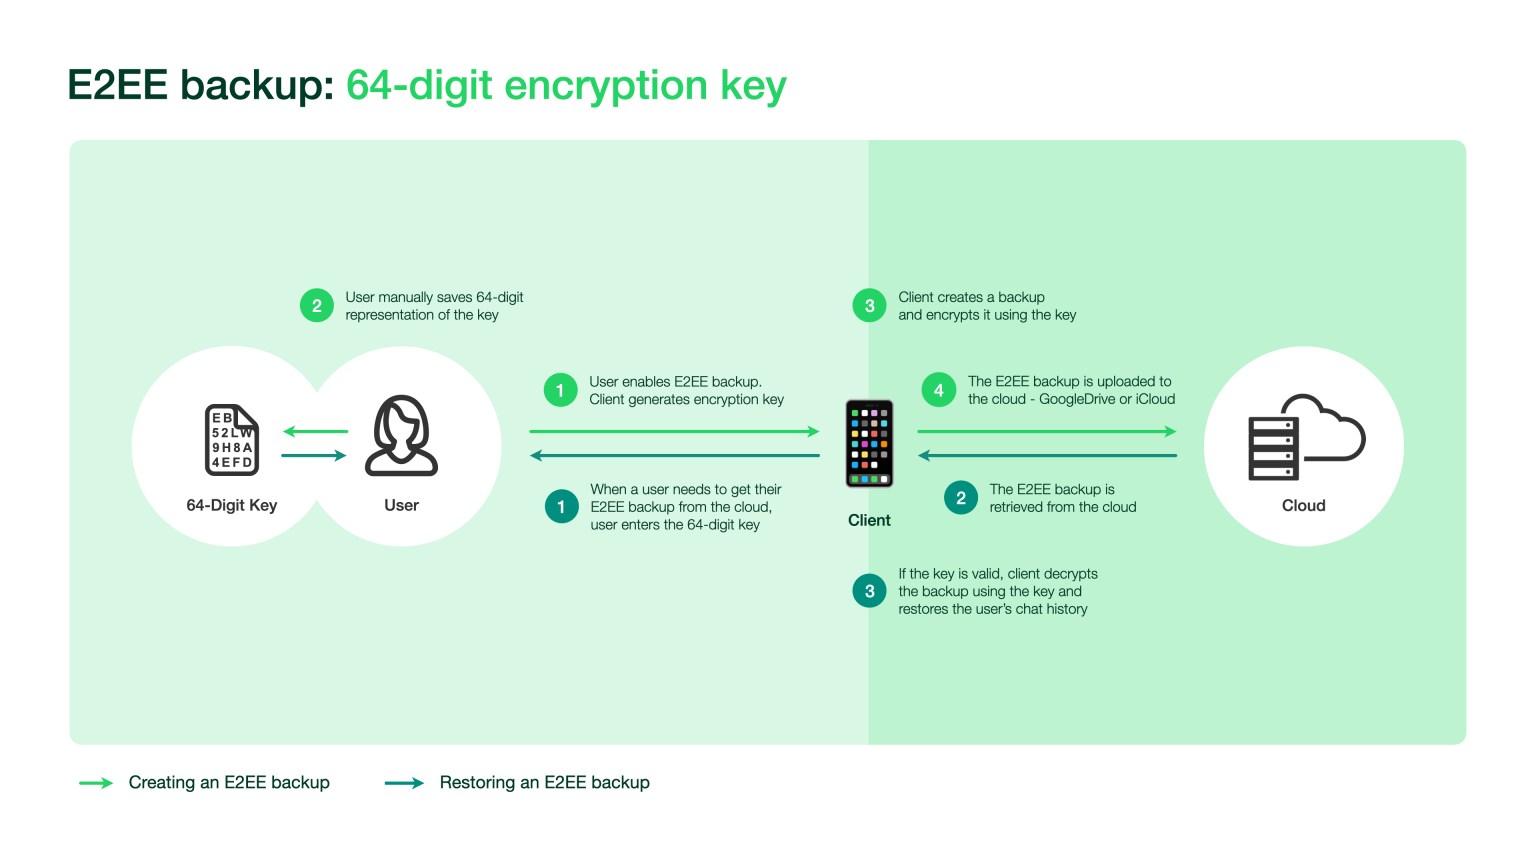 WhatsApp ofrecerá copias de seguridad encriptadas de extremo a extremo